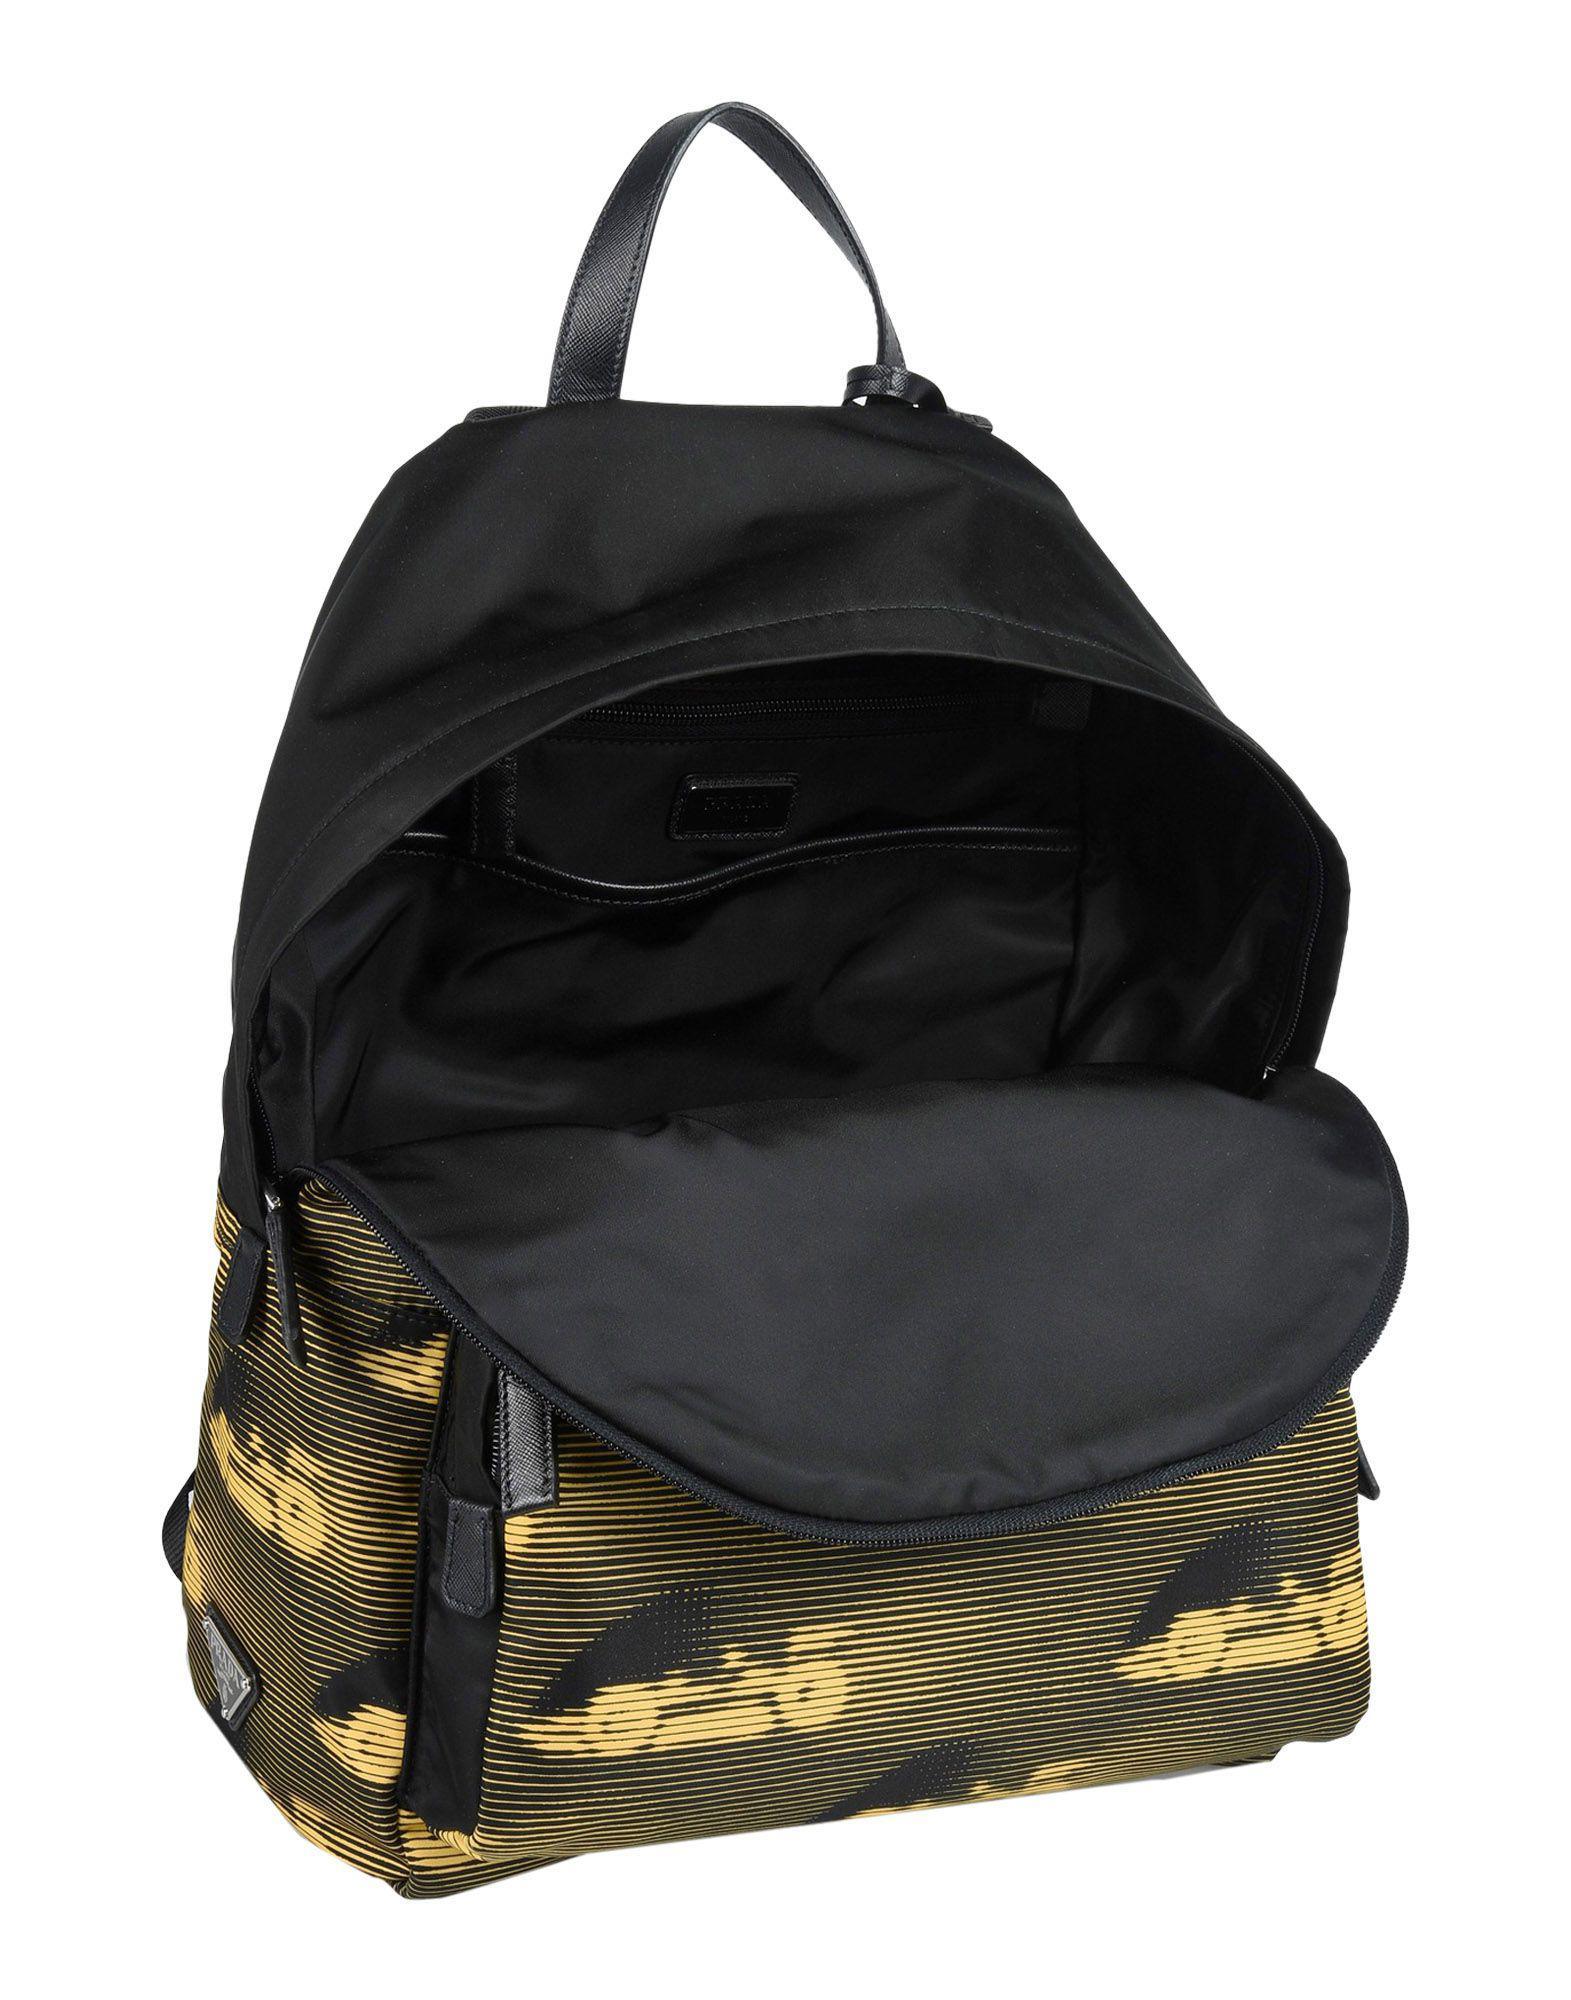 Lyst In Bum Prada amp; Bags Backpacks Black qpRIFI4Yw